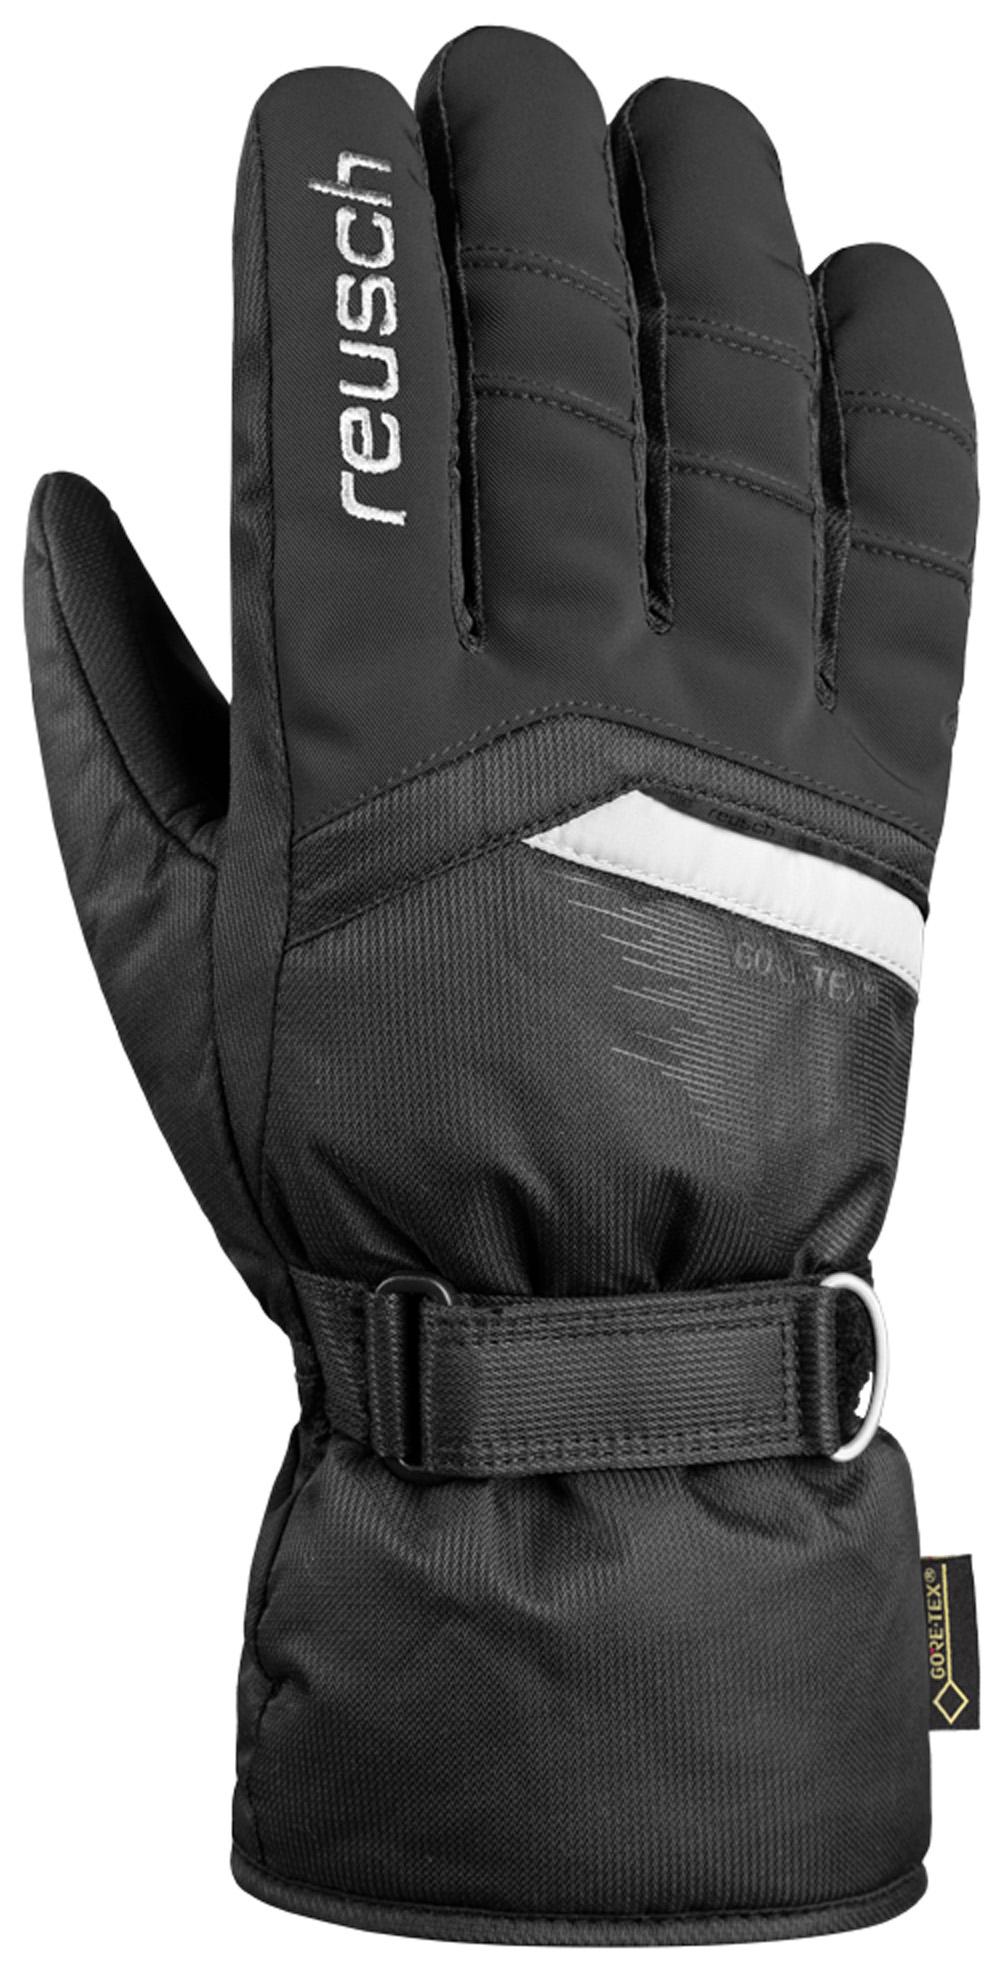 Reusch BOLT GTX®, muške skijaške rukavice, crna